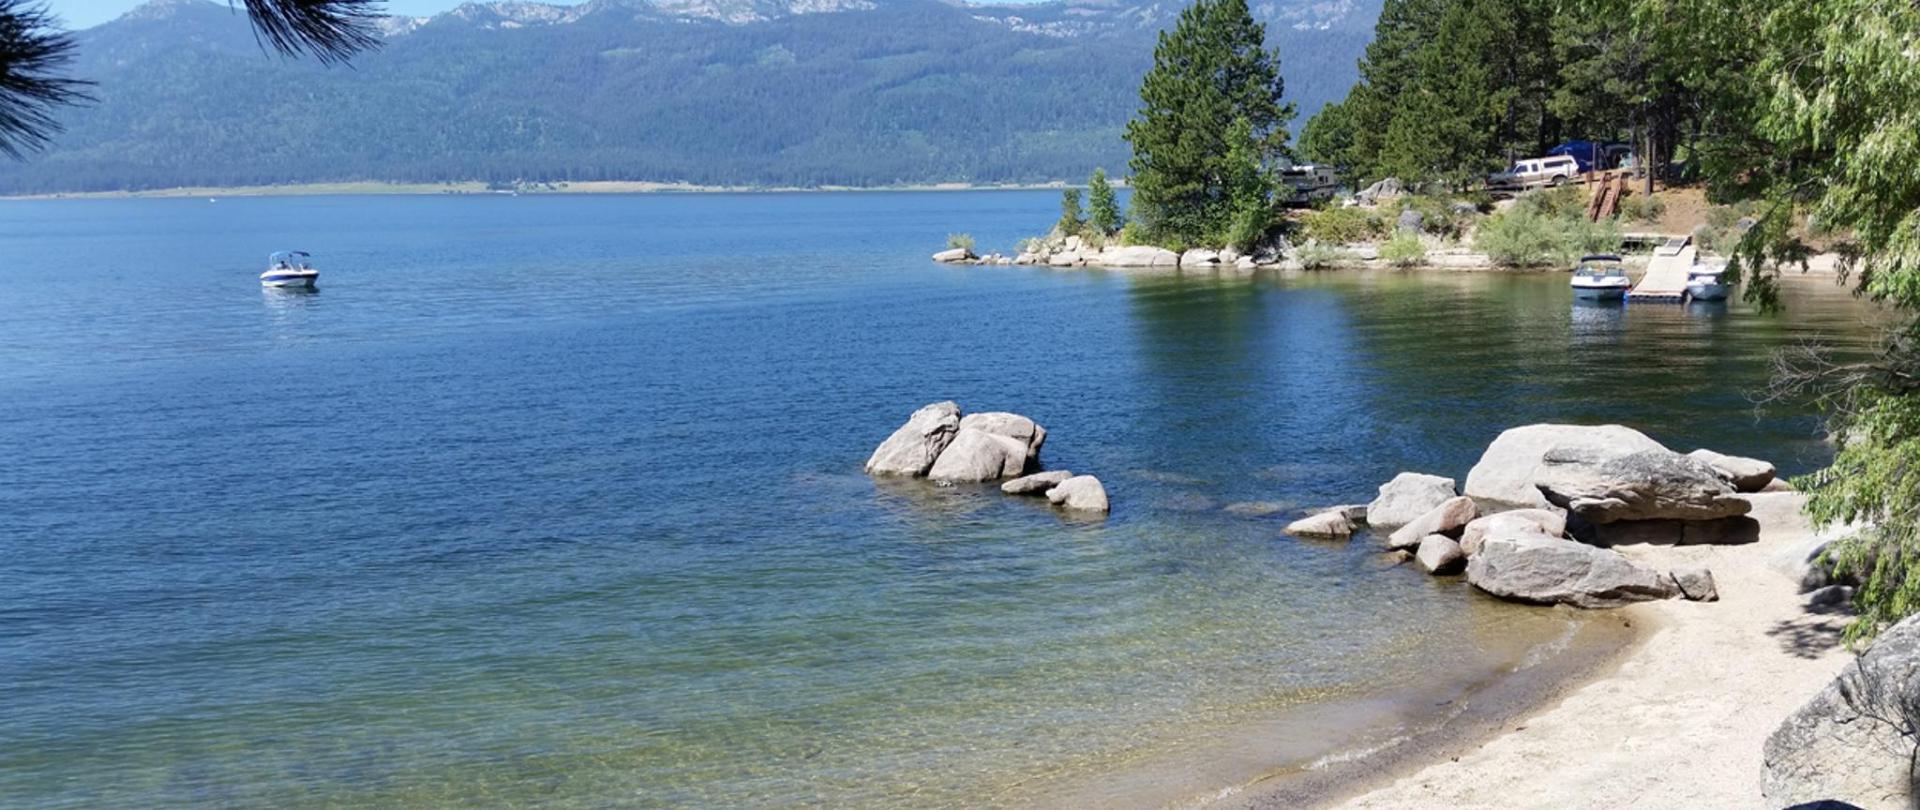 LakeCascade3.jpg